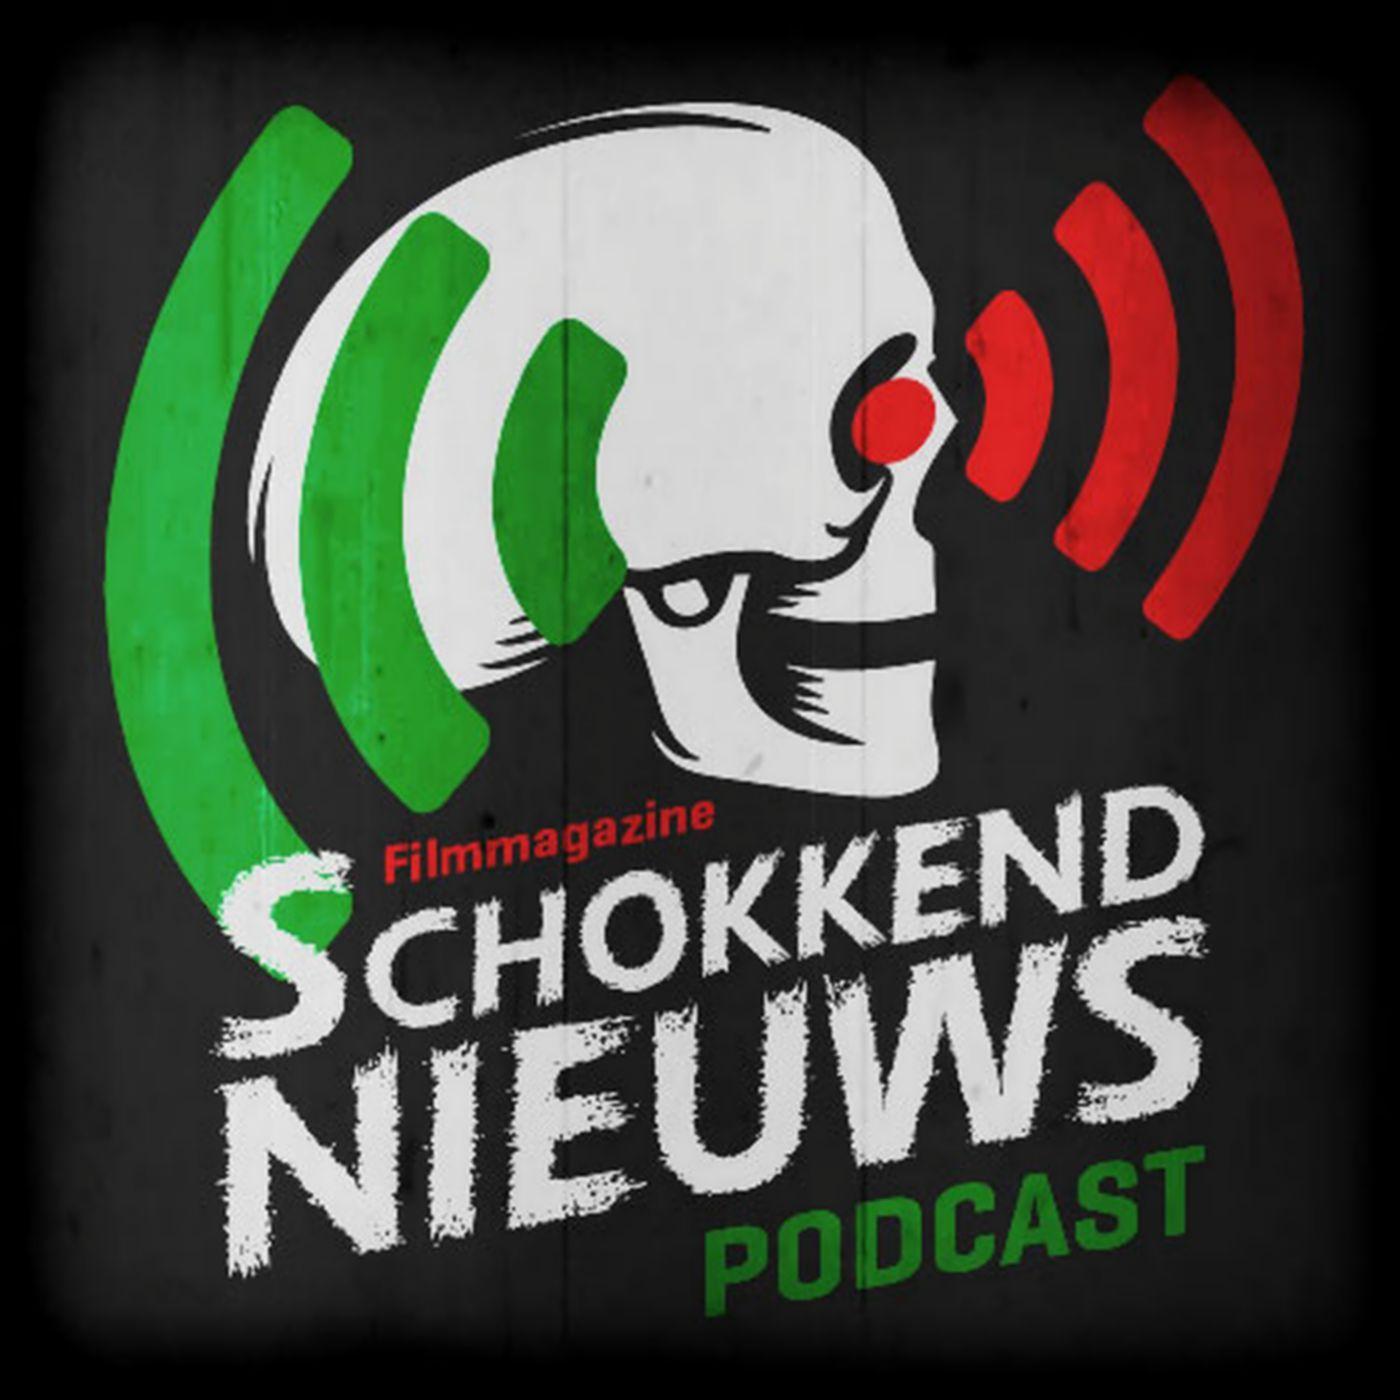 Schokkend Nieuws Podcast logo